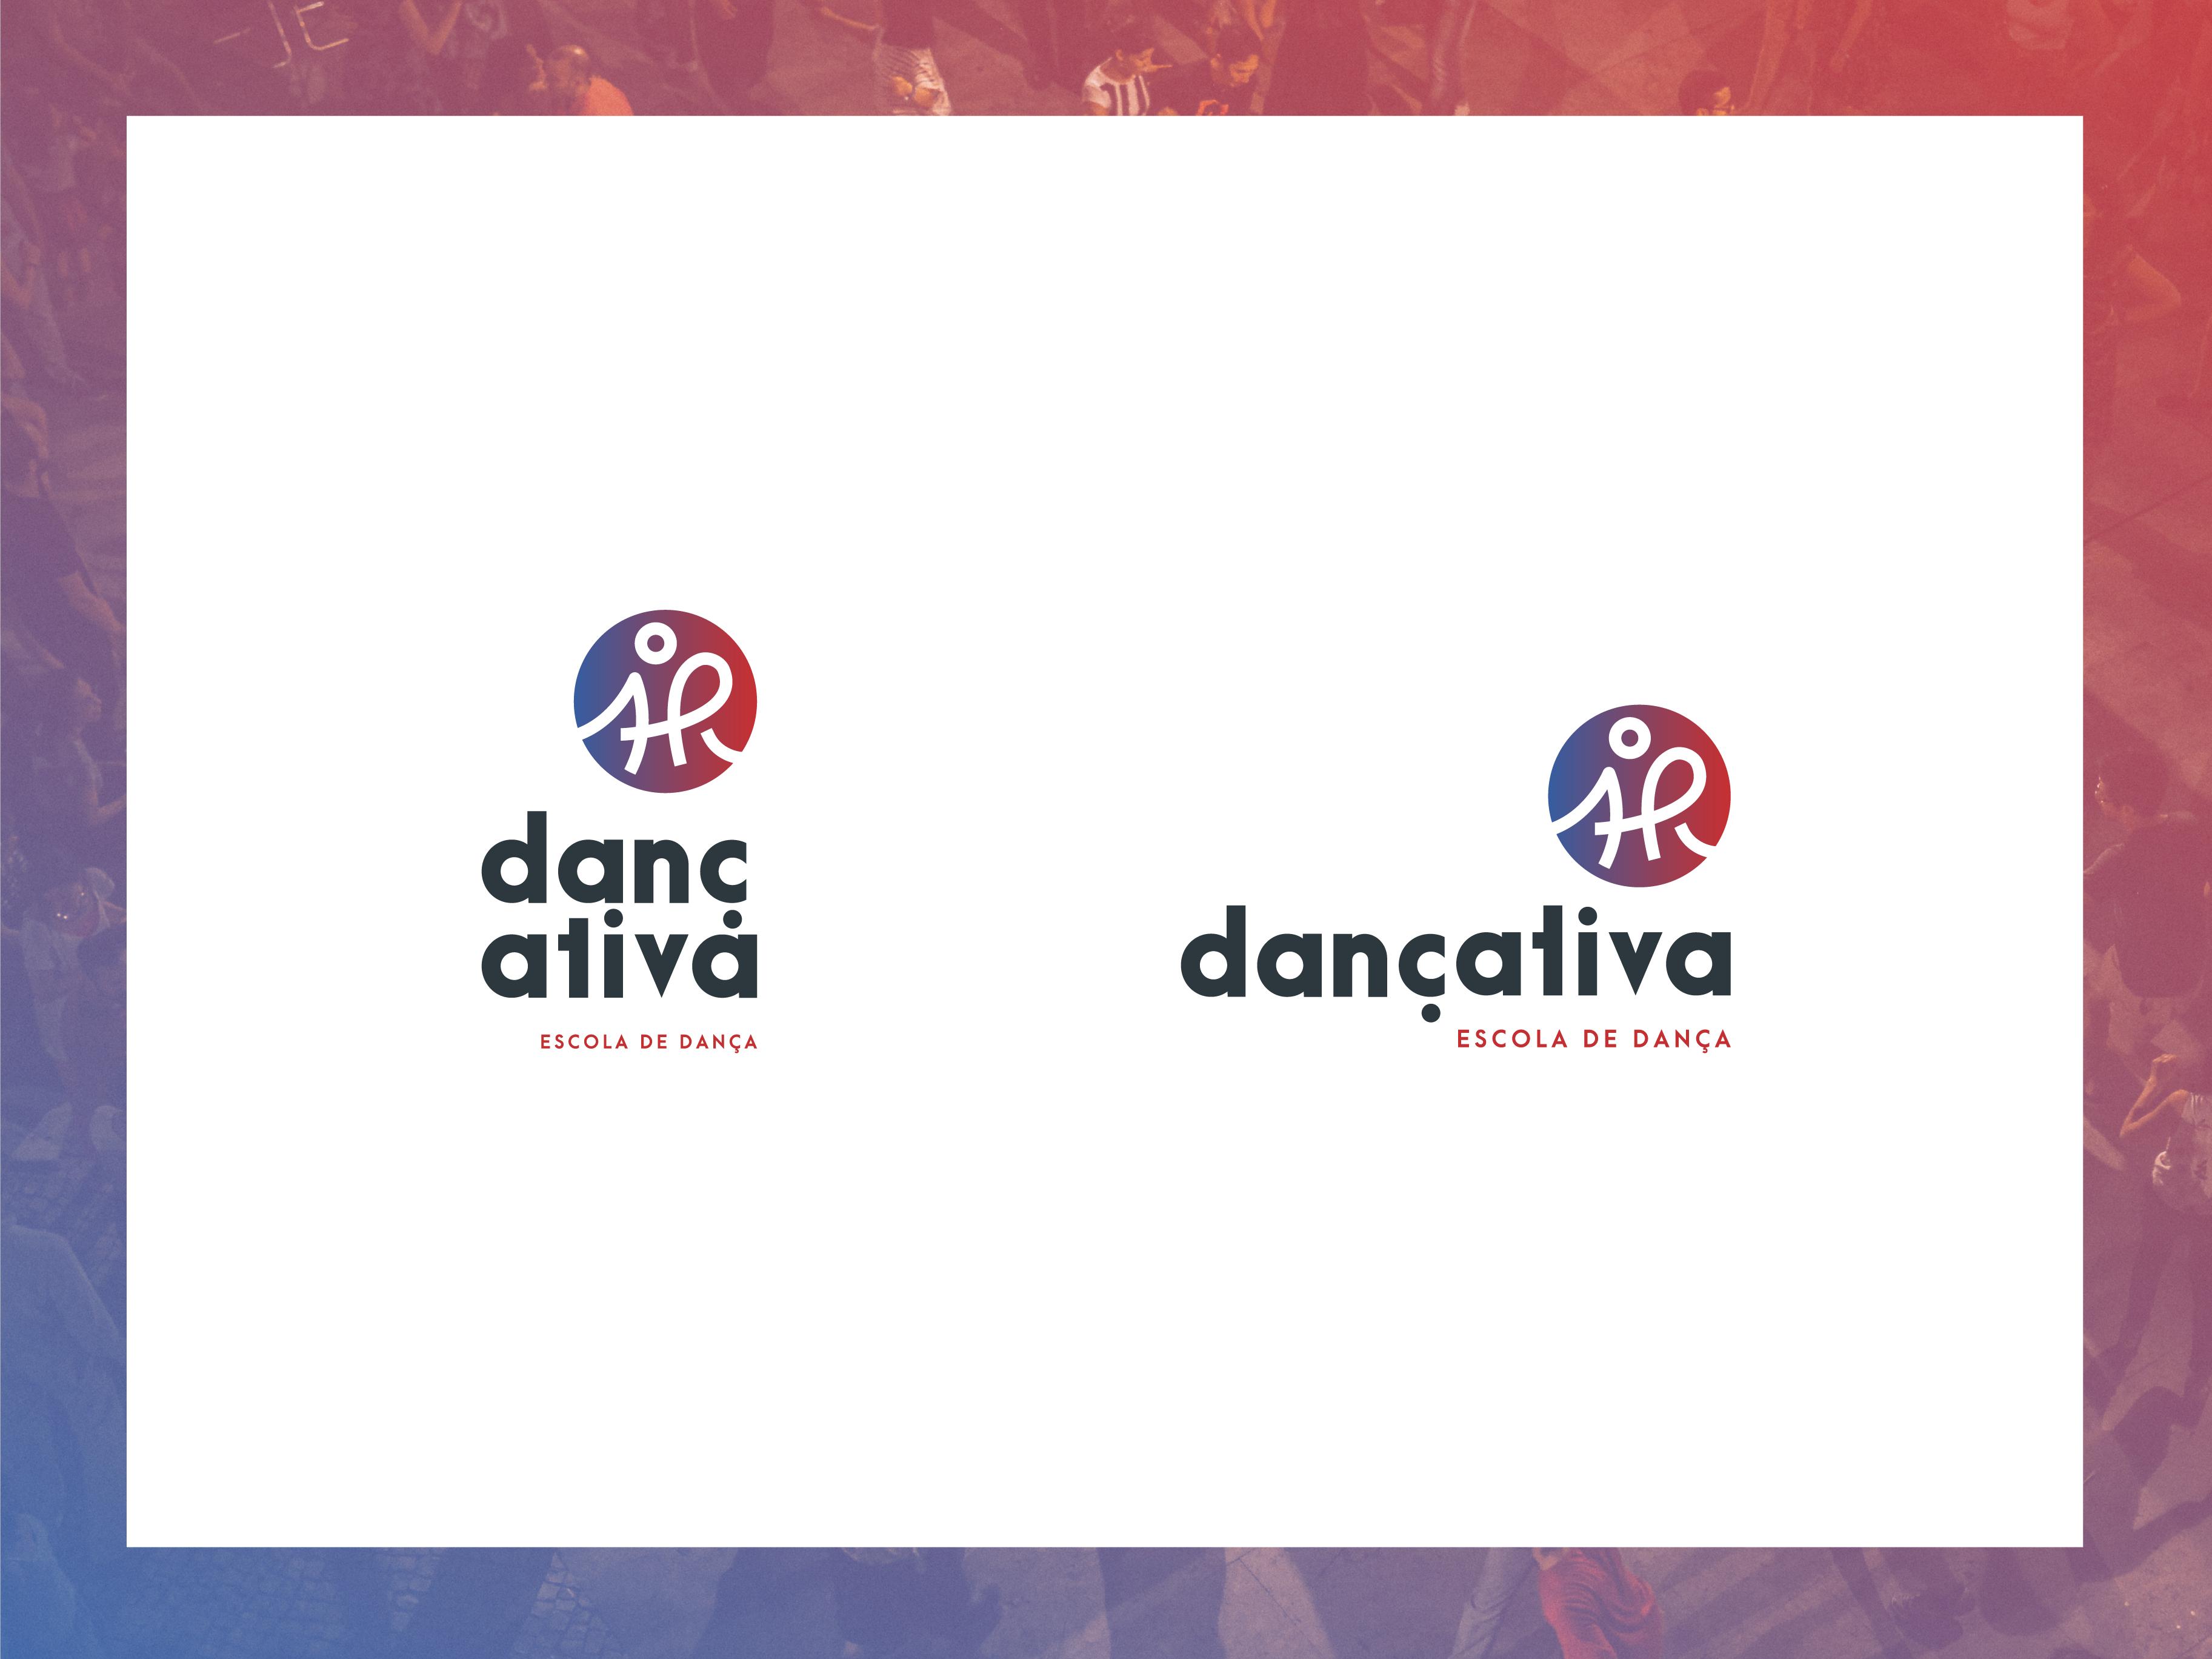 DançAtiva Latin Dance School.